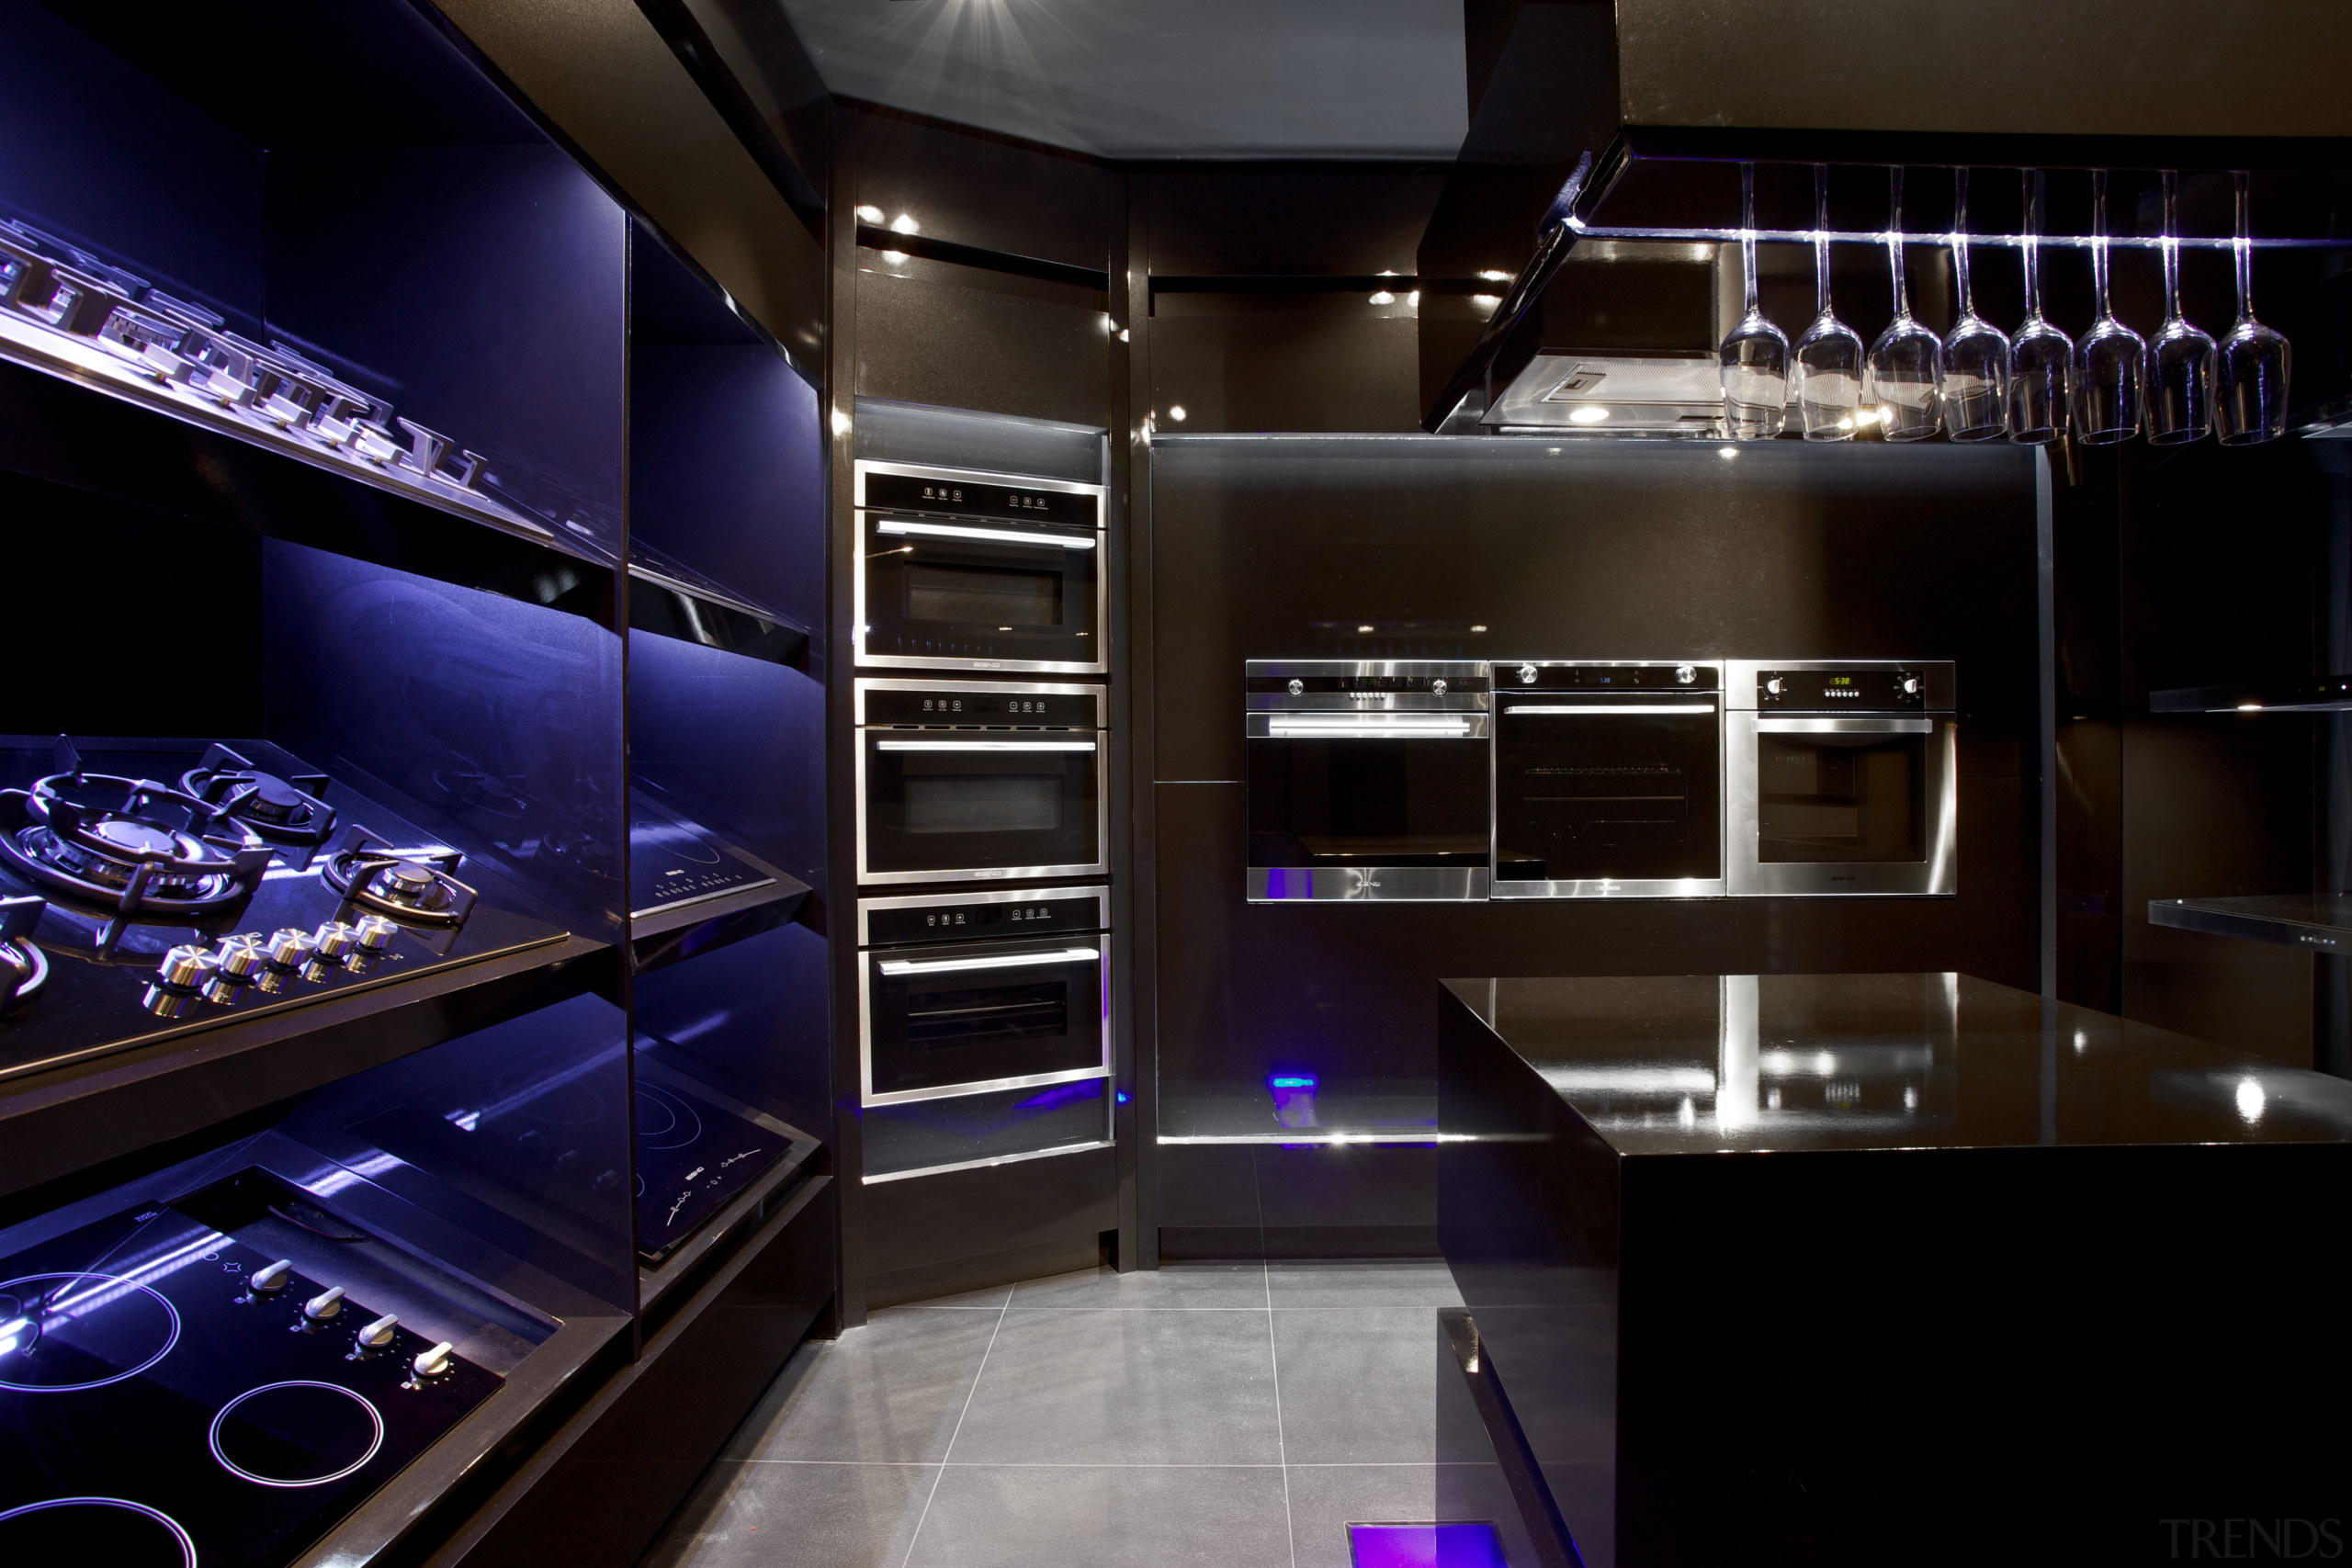 Eisno Lifetech Appliances is an international company focused countertop, interior design, kitchen, room, black